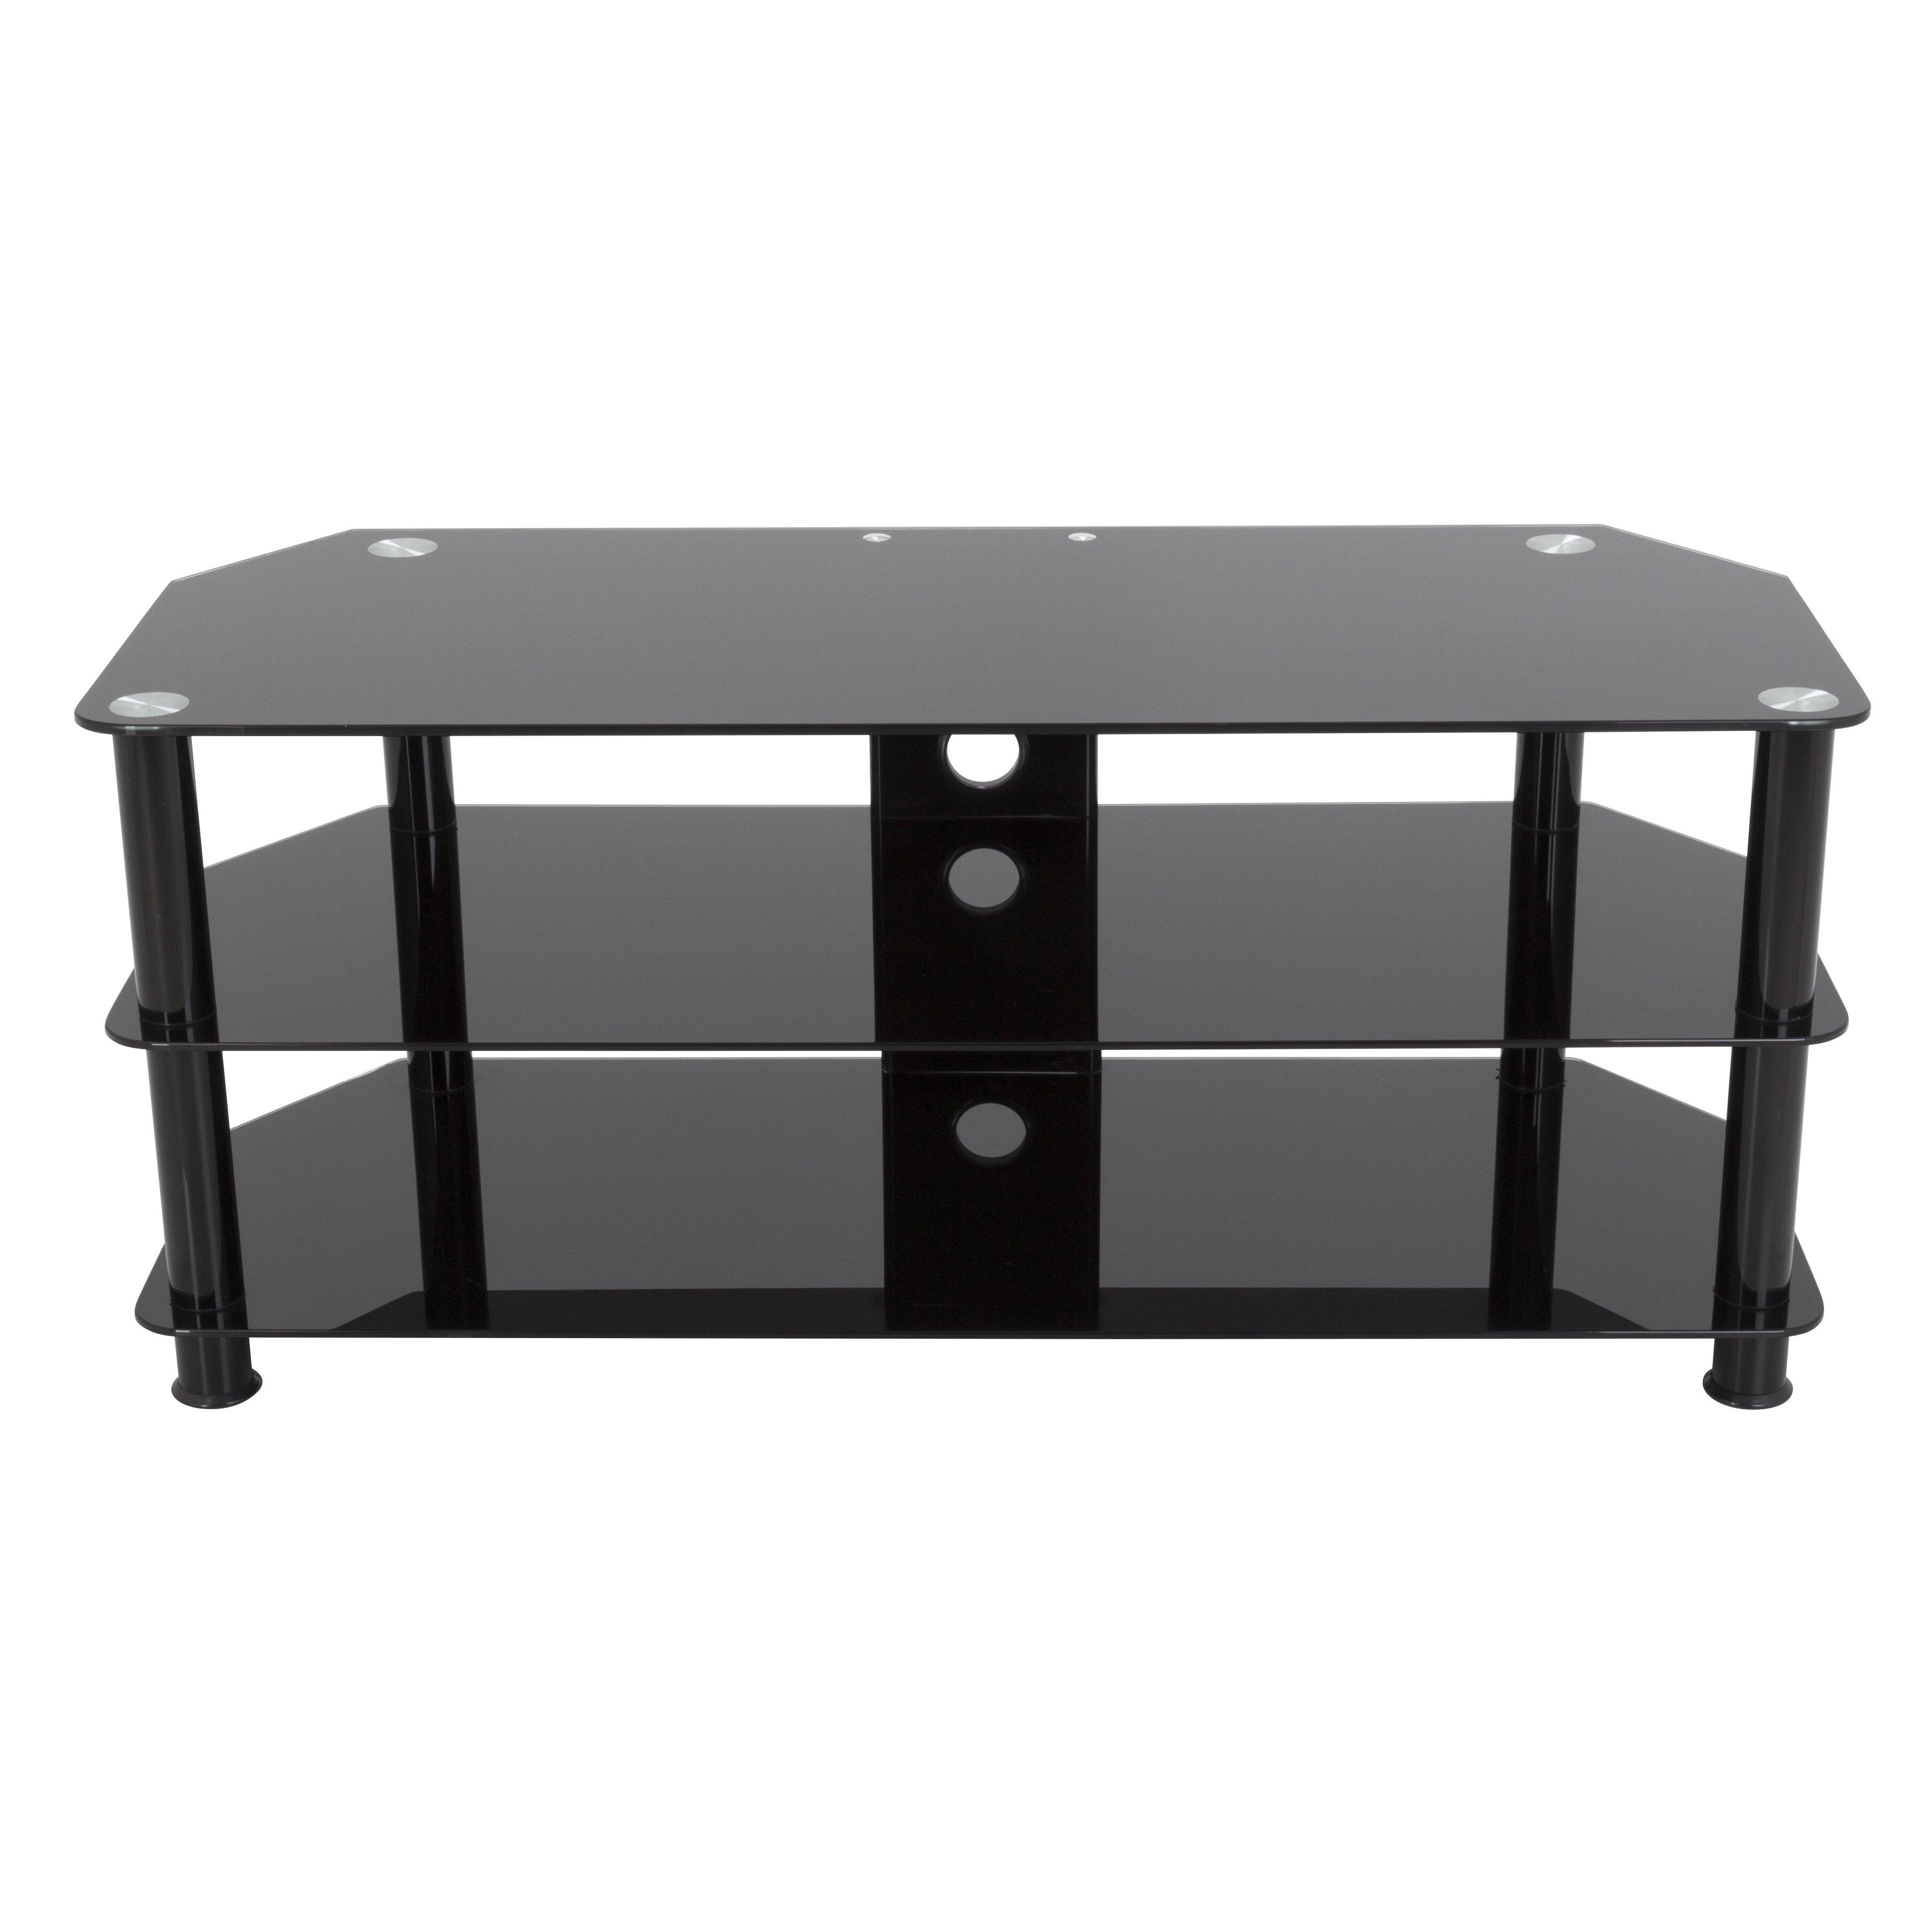 Avf glass tv stand reviews for Avf furniture